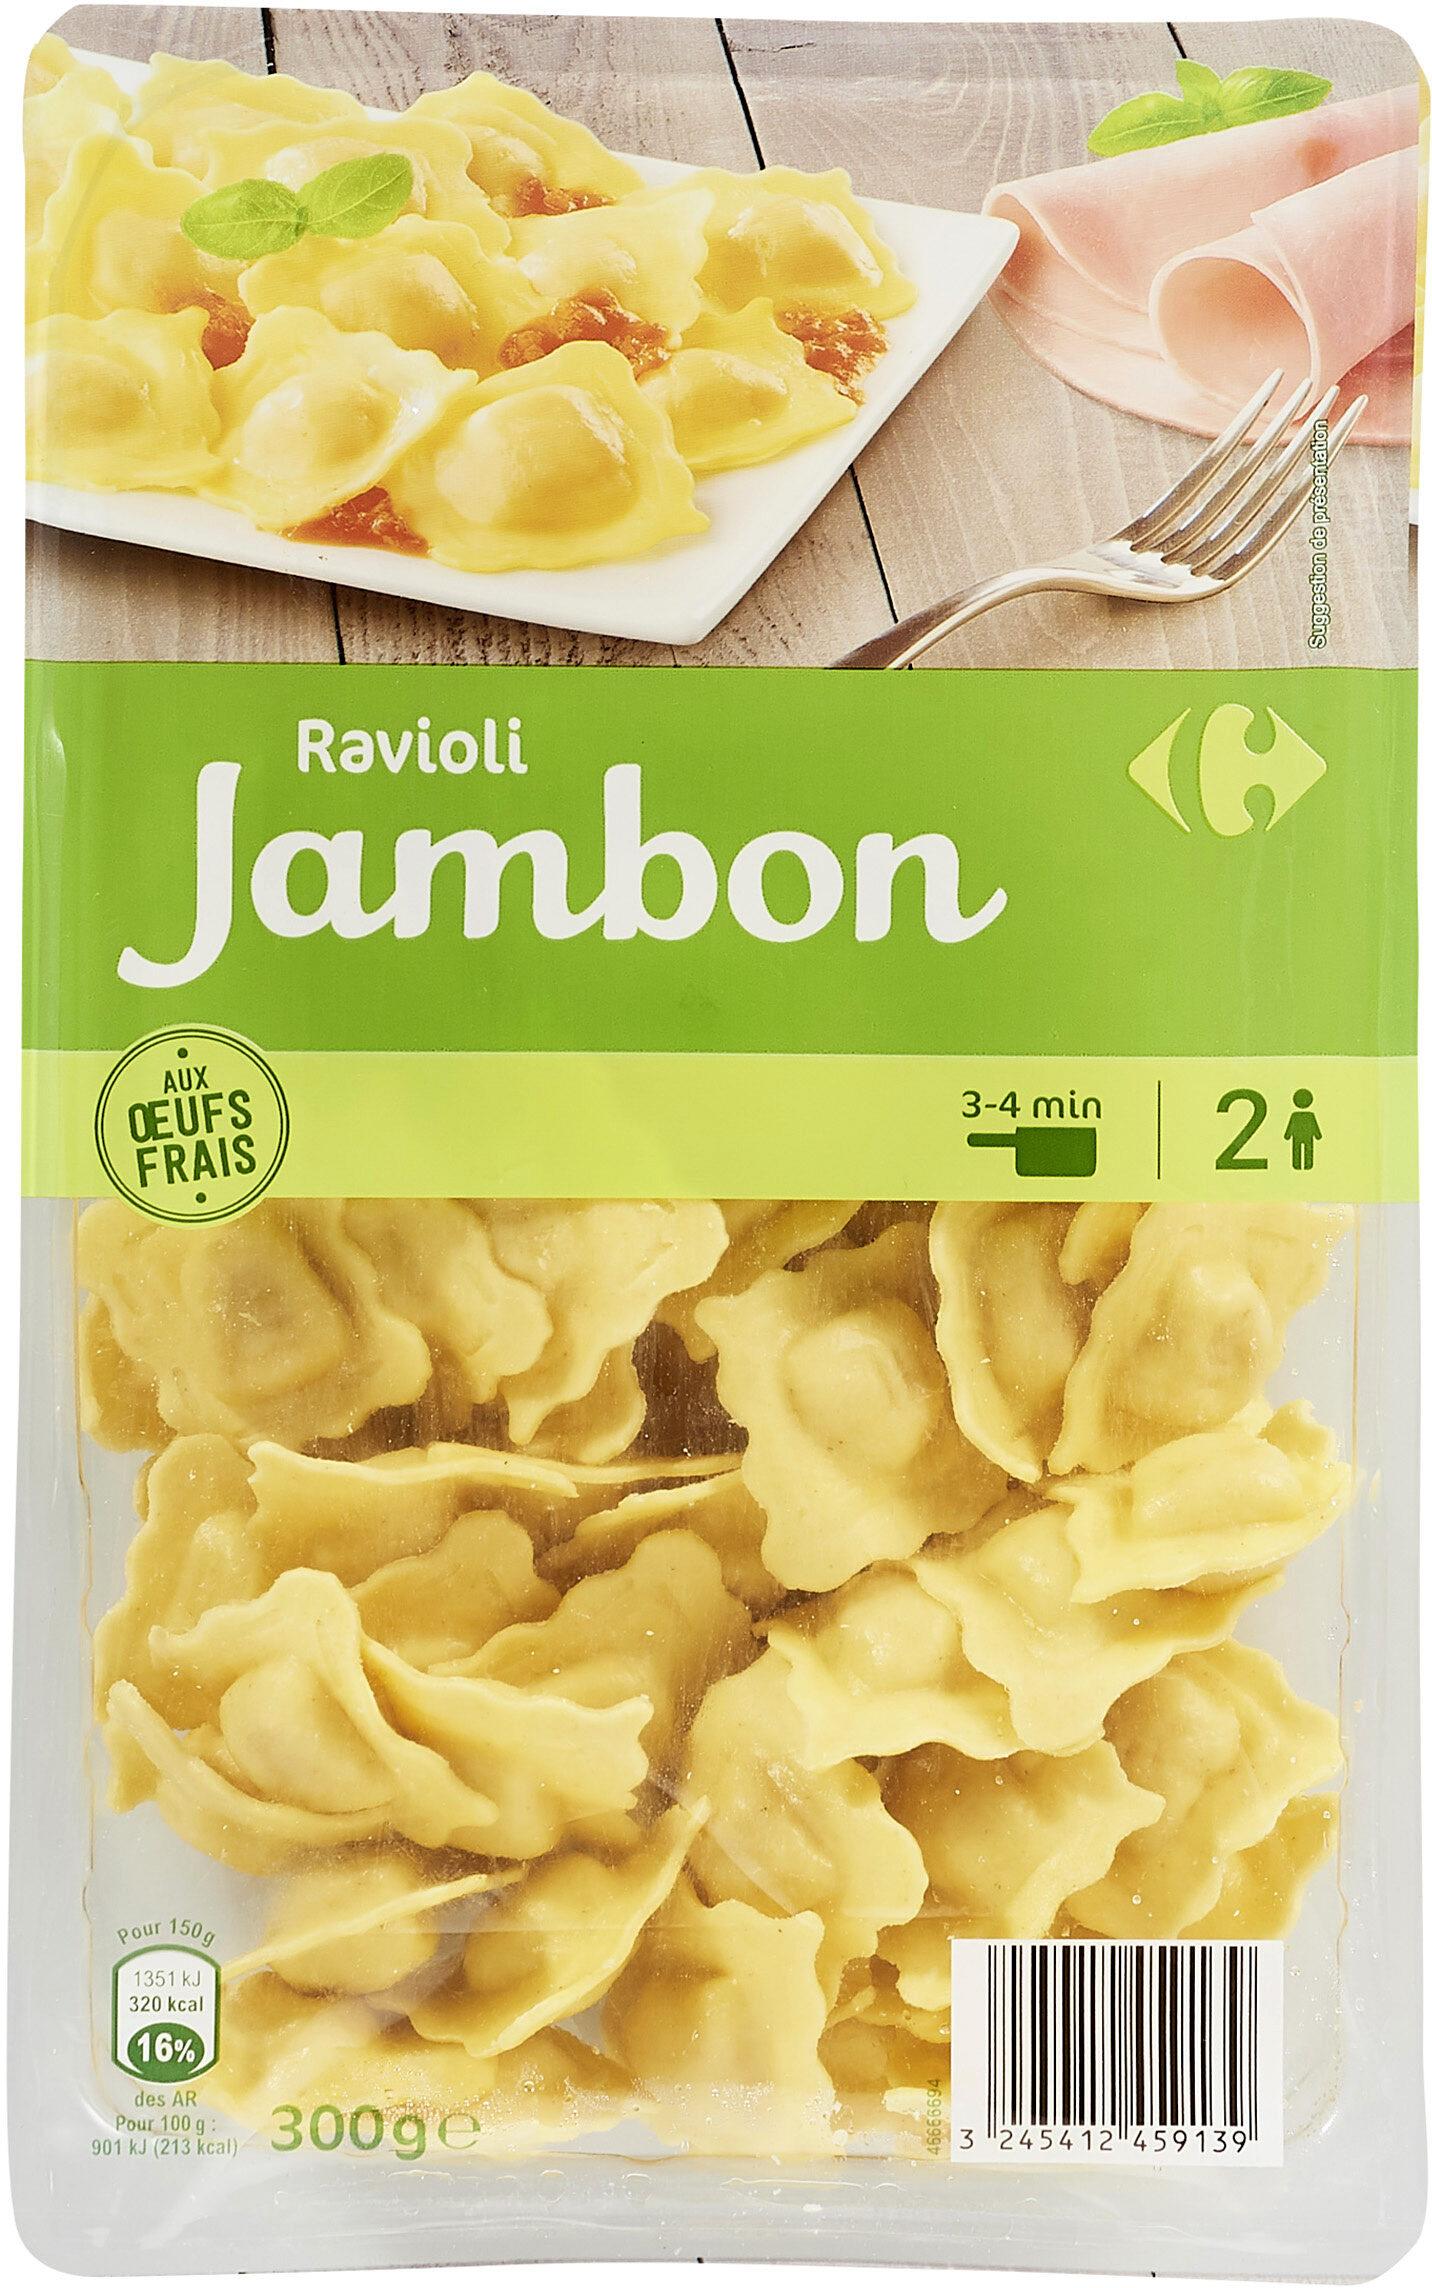 Ravioli au jambon - Produit - fr